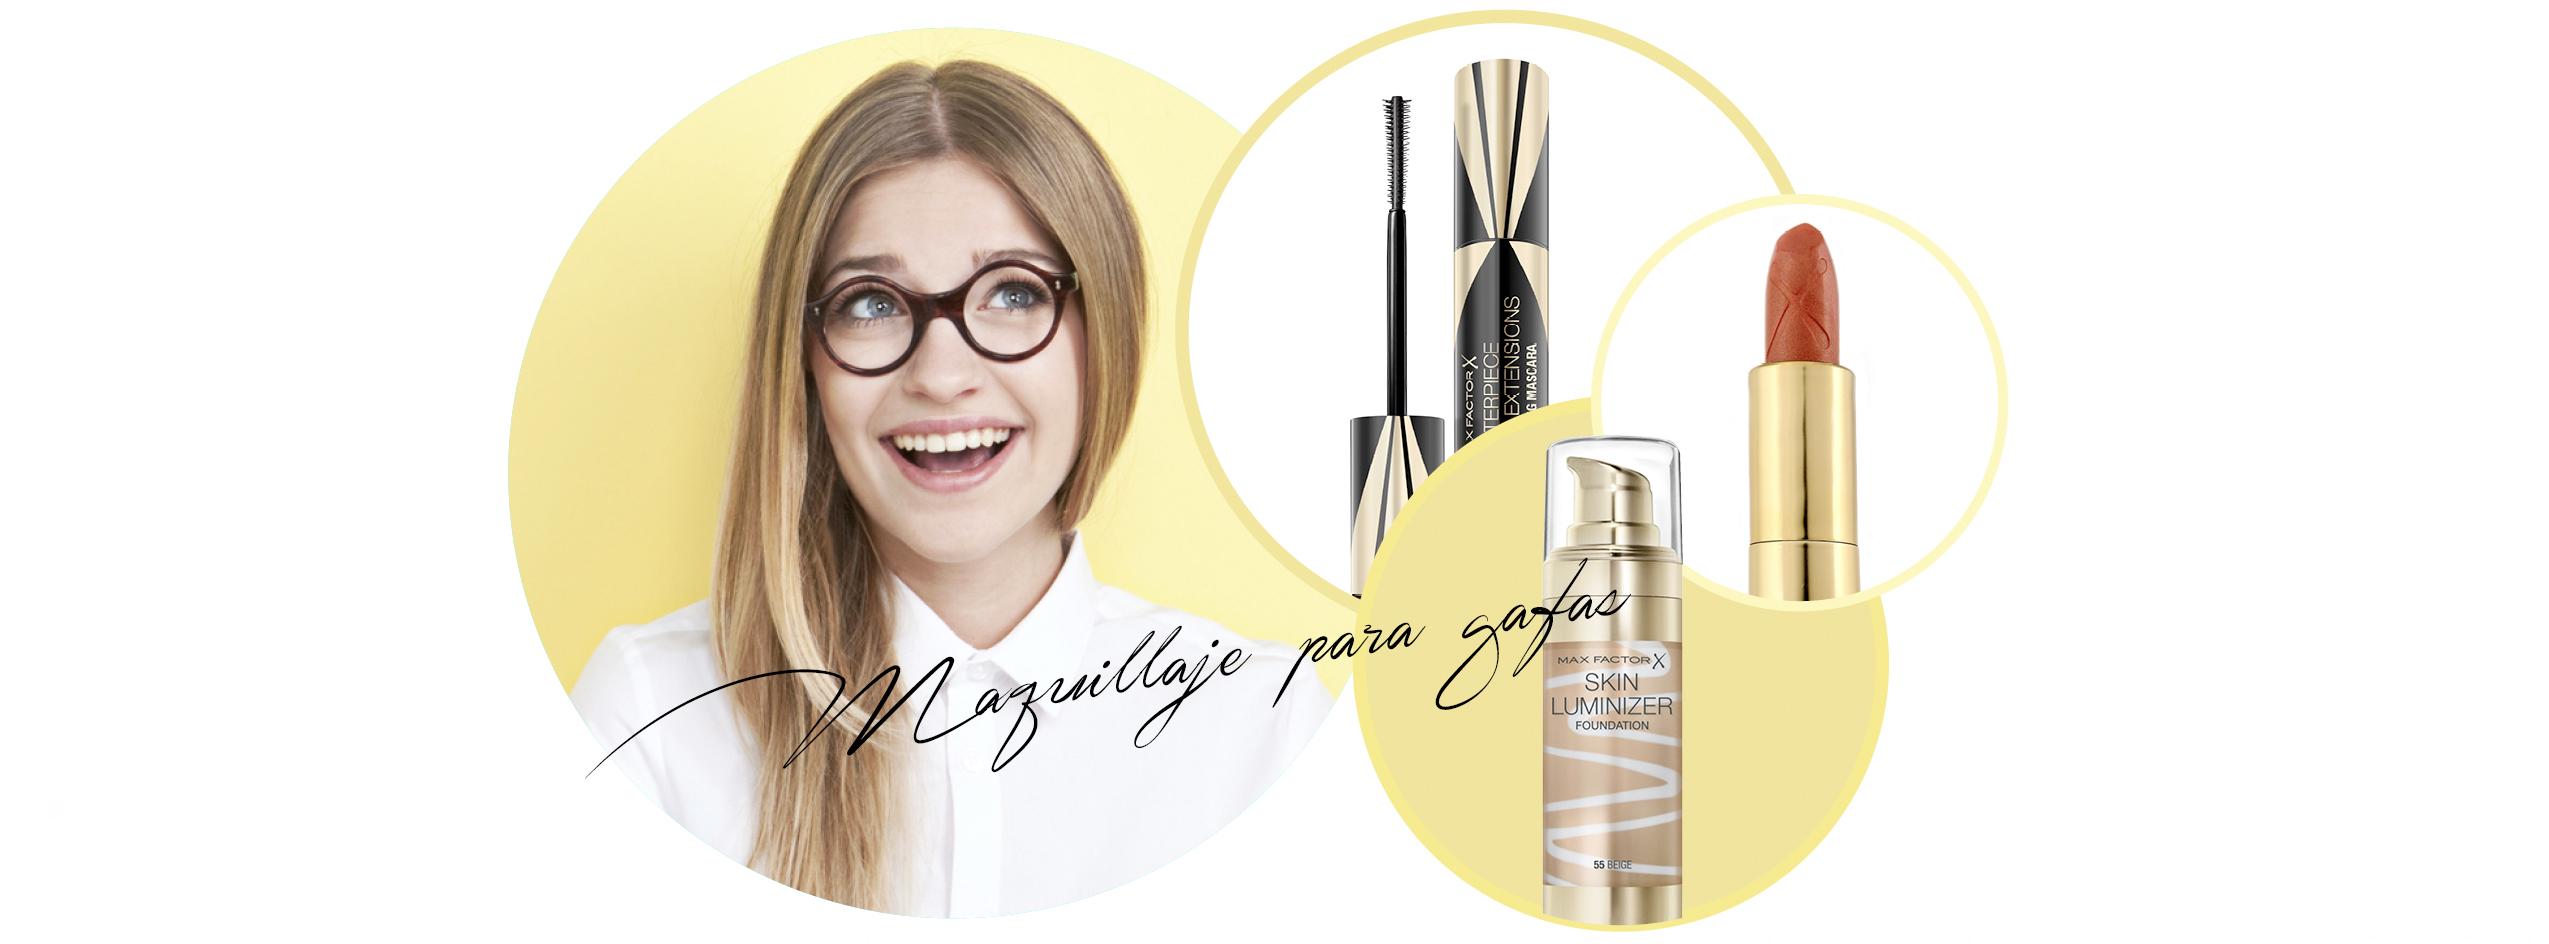 Max Factor trucos maquillaje gafas